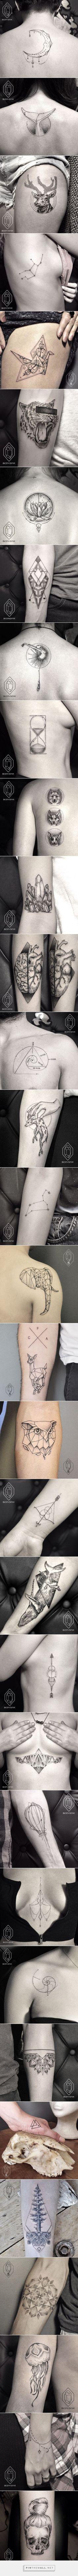 Minimalist Line And Dot Tattoos By Turkish Artist Bicem Sinik - created via http://pinthemall.net